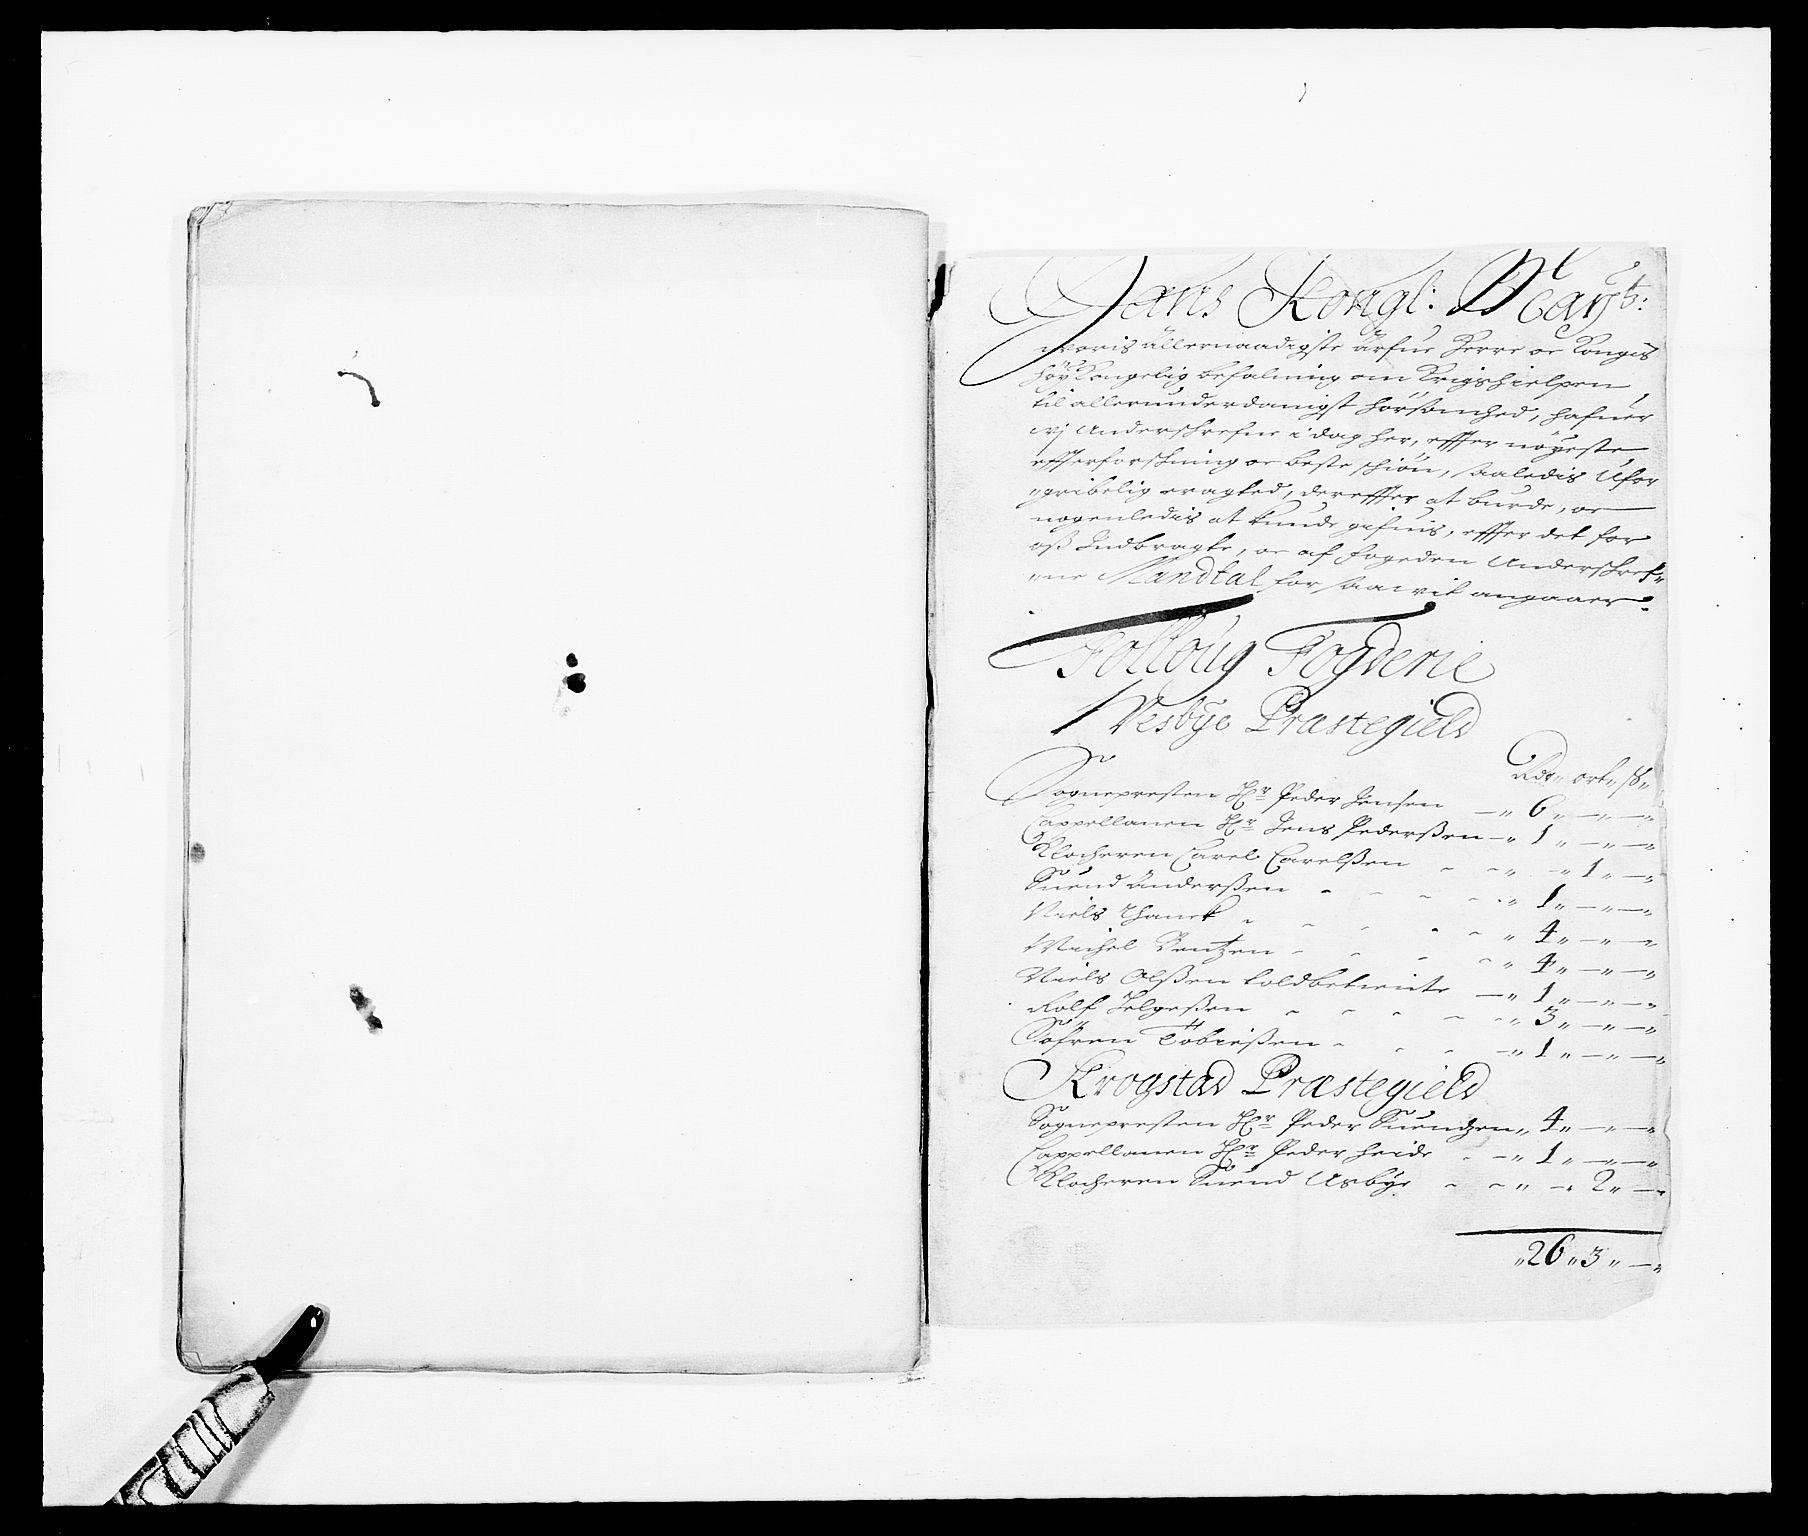 RA, Rentekammeret inntil 1814, Reviderte regnskaper, Fogderegnskap, R09/L0430: Fogderegnskap Follo, 1682-1683, s. 470